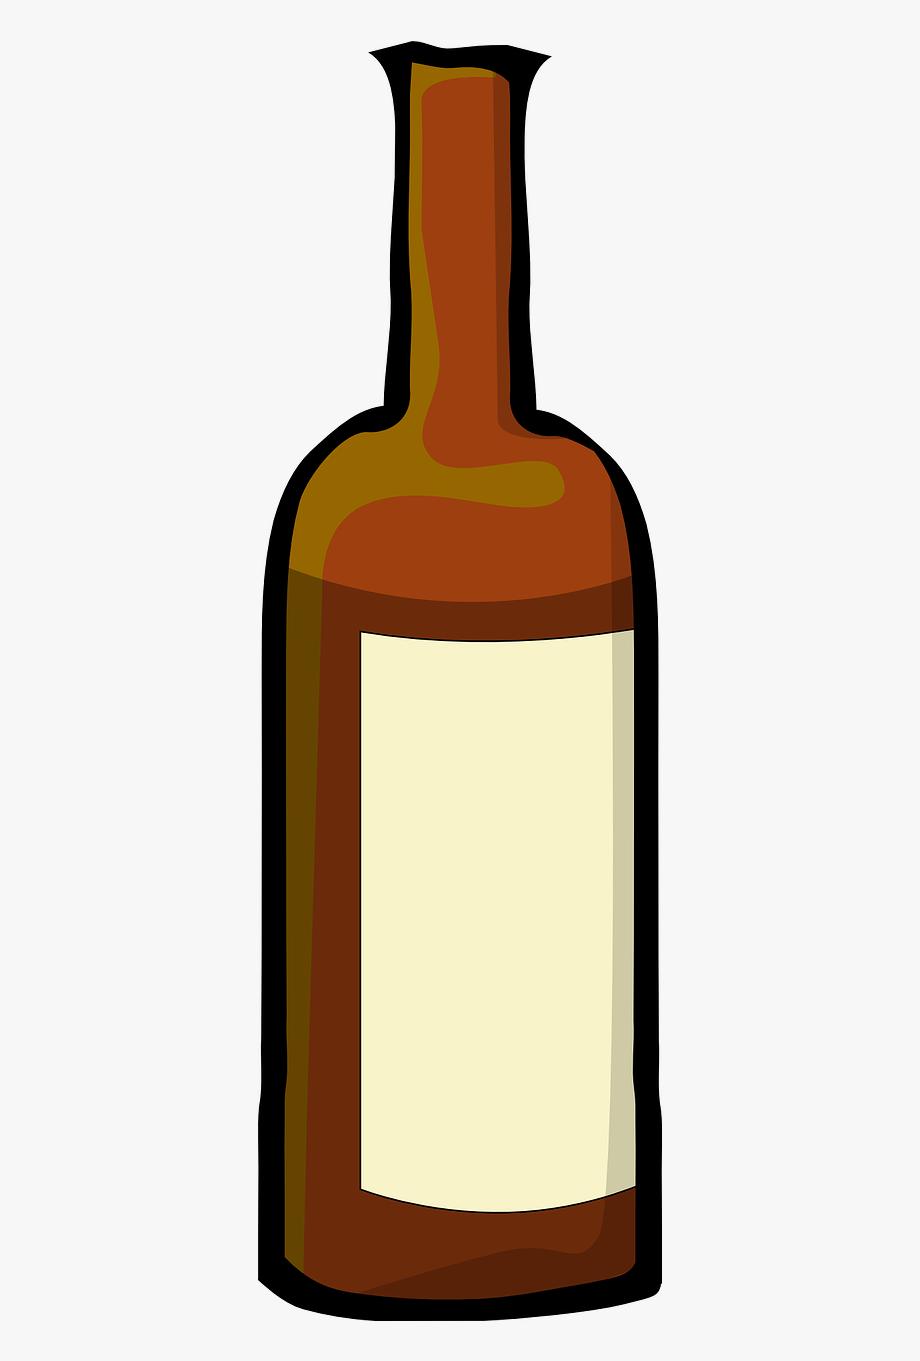 Liquor Drink Beverage Png Image Picpng.